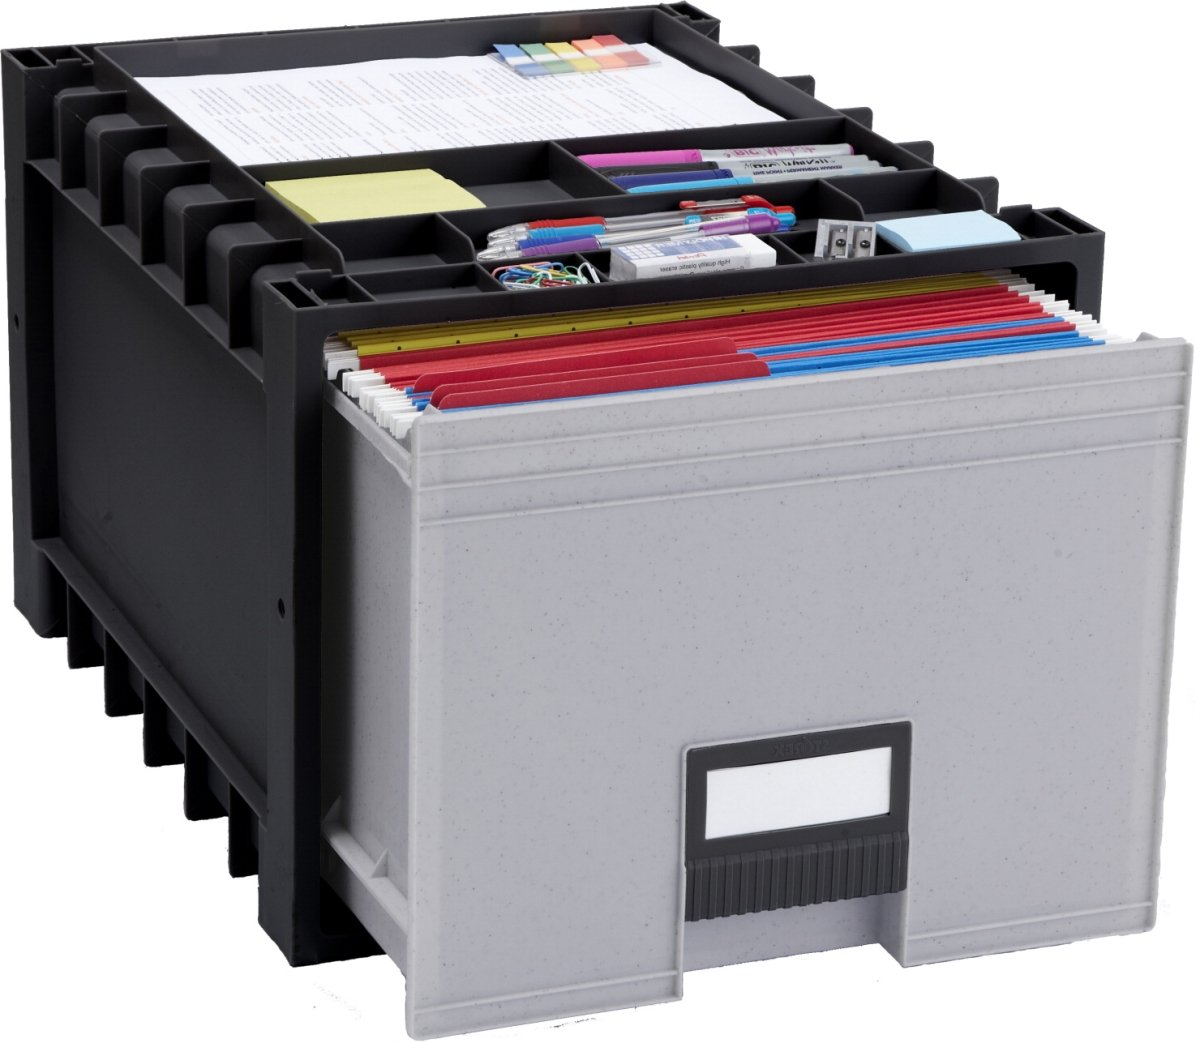 Storex 1537295 18 in Archive Drawer - Black & Gray